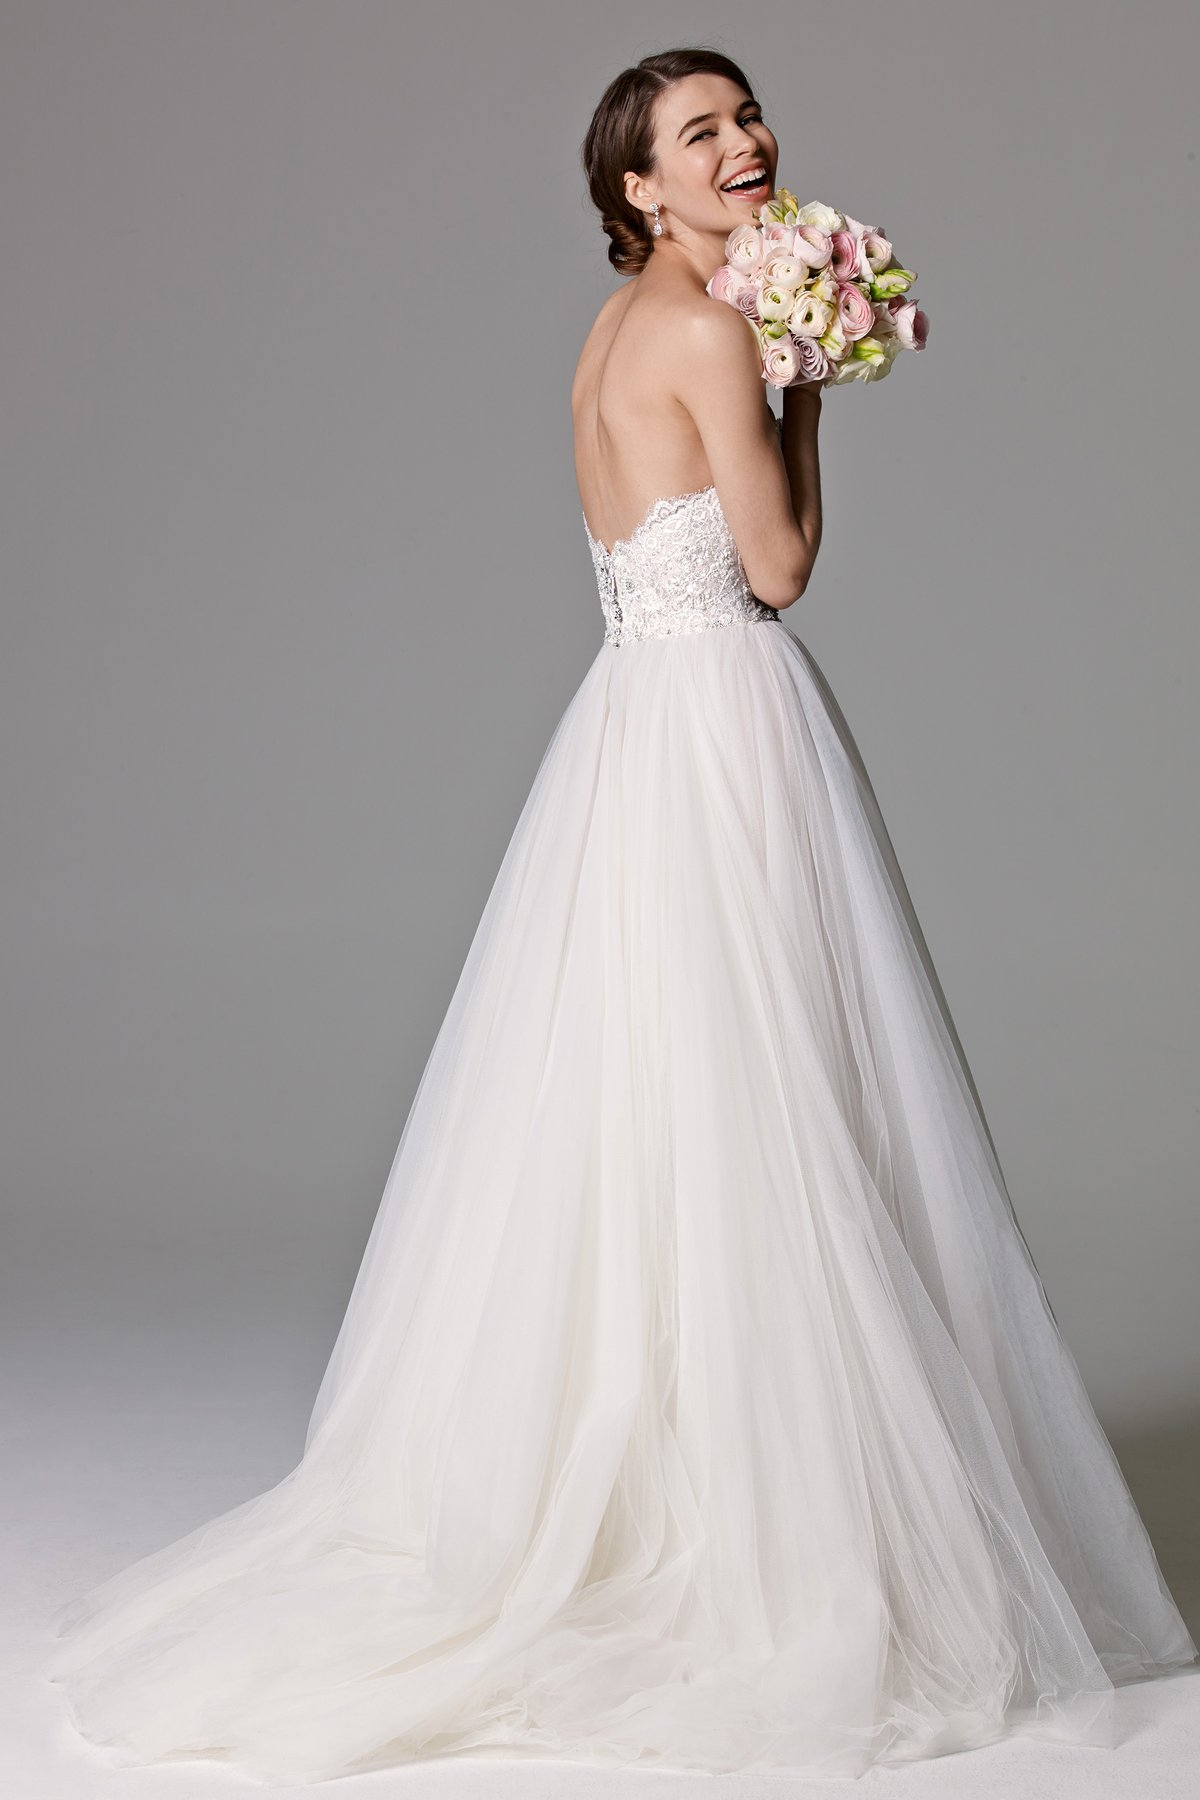 Sheridan 8019B | Watters Brides | Watters